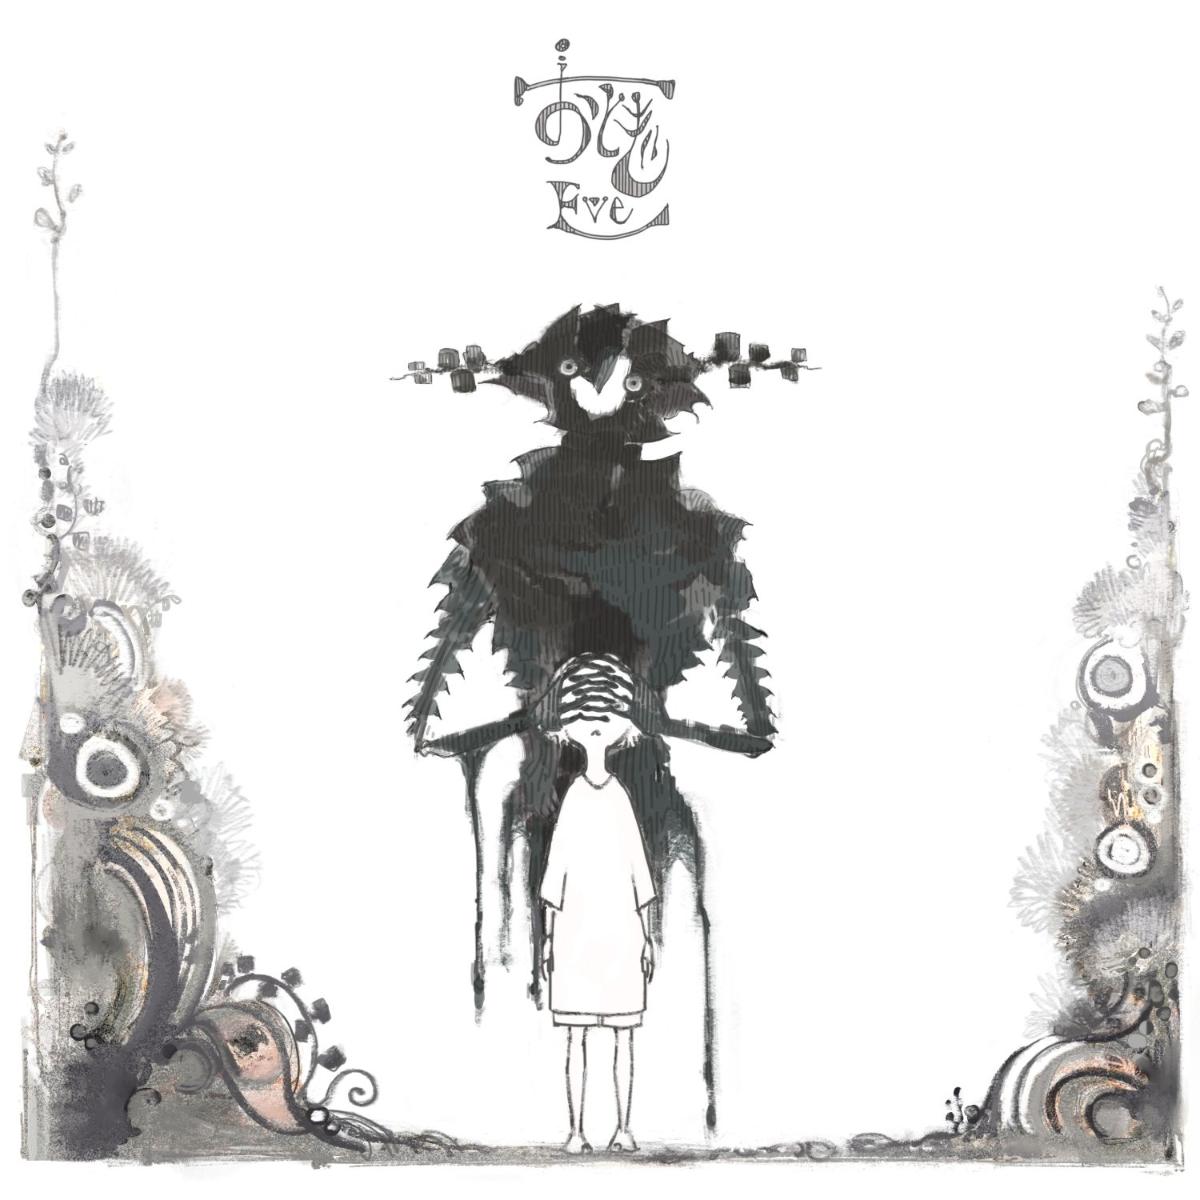 Eve おとぎ (初回限定盤 CD+DVD)